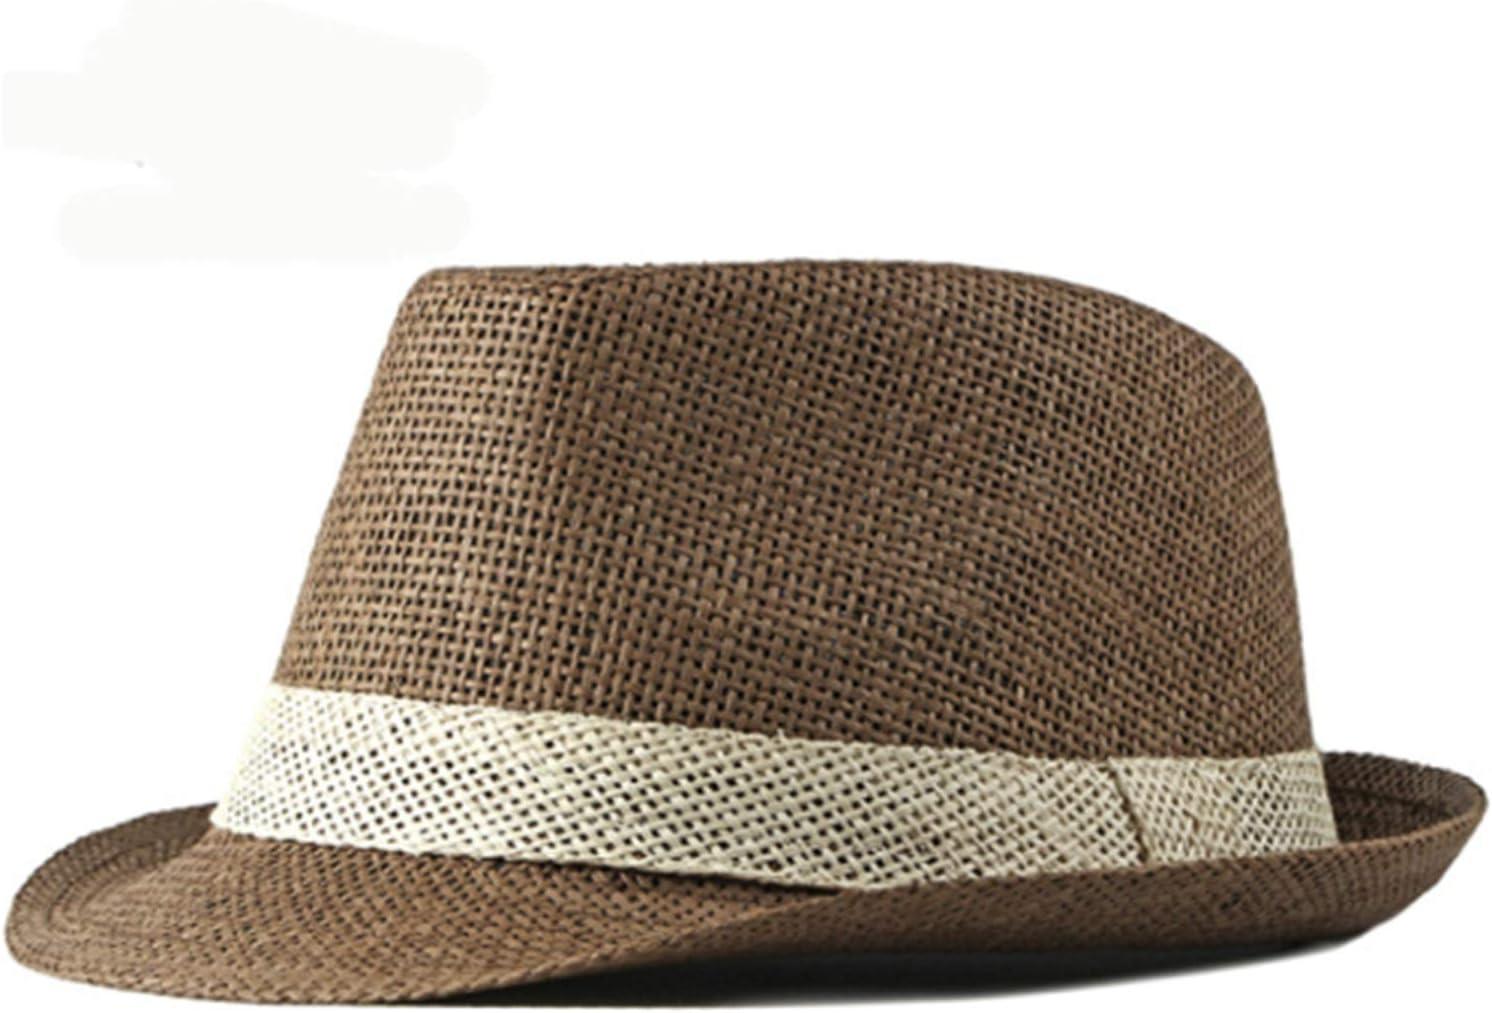 CHENGCHAO Sun hat Summer Women Sale Special Price Men P Trilby Brim Hat Short mart Straw